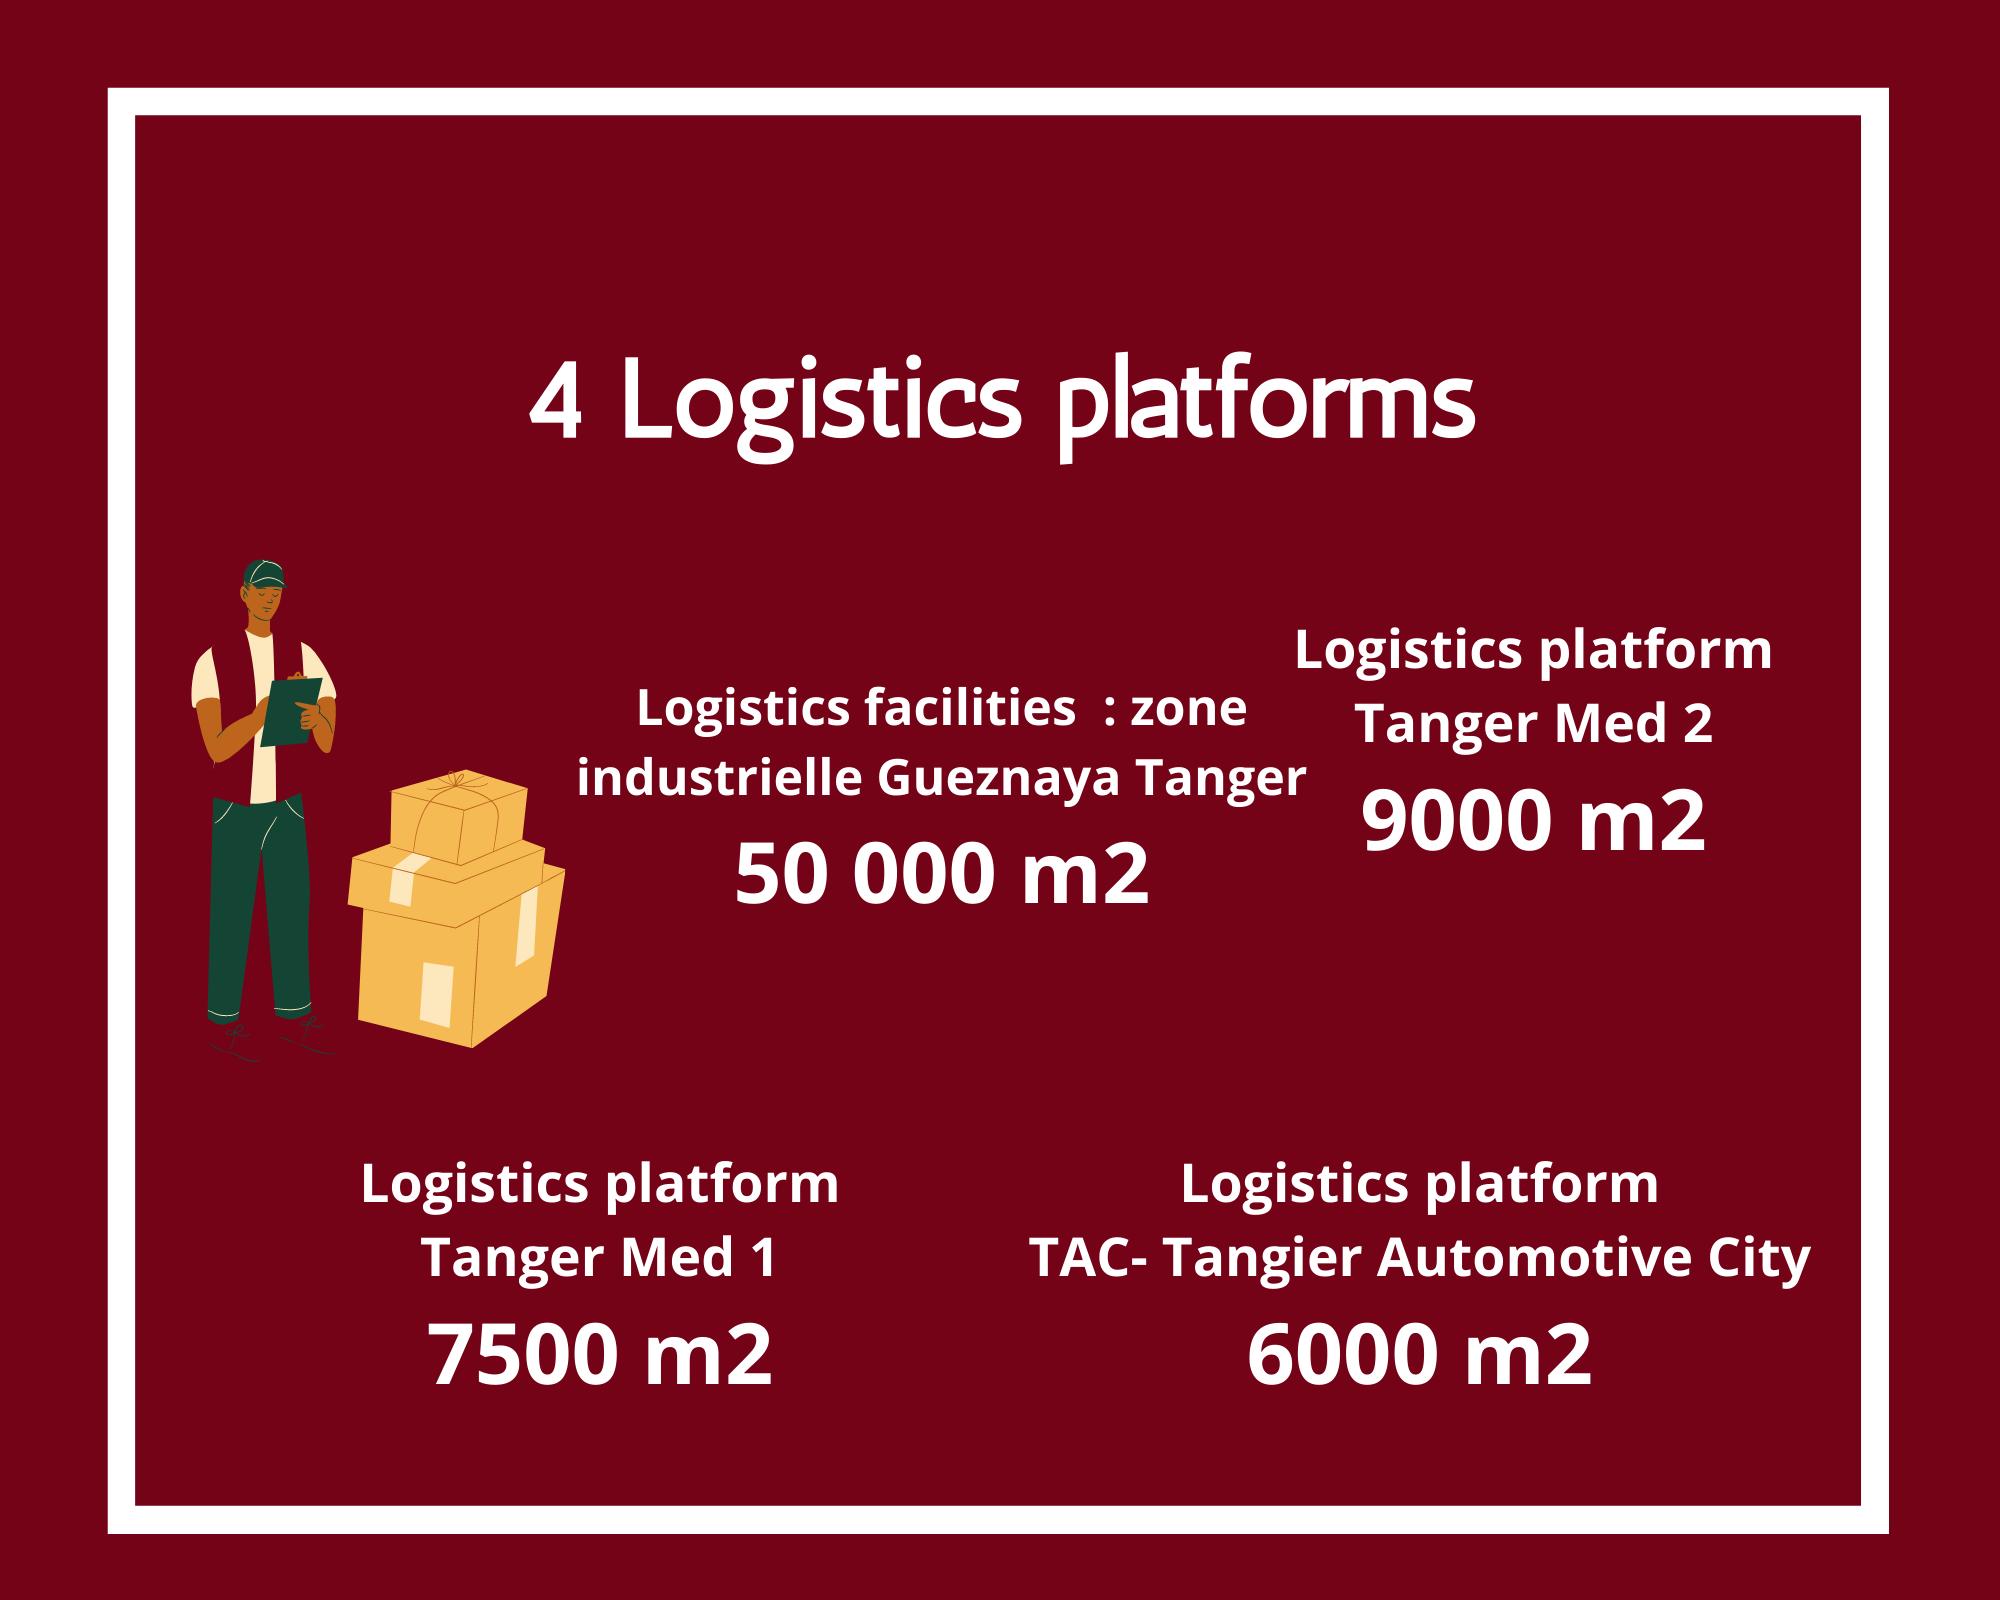 Plateforme logistique zone industrielle Gueznaya Tanger (3)